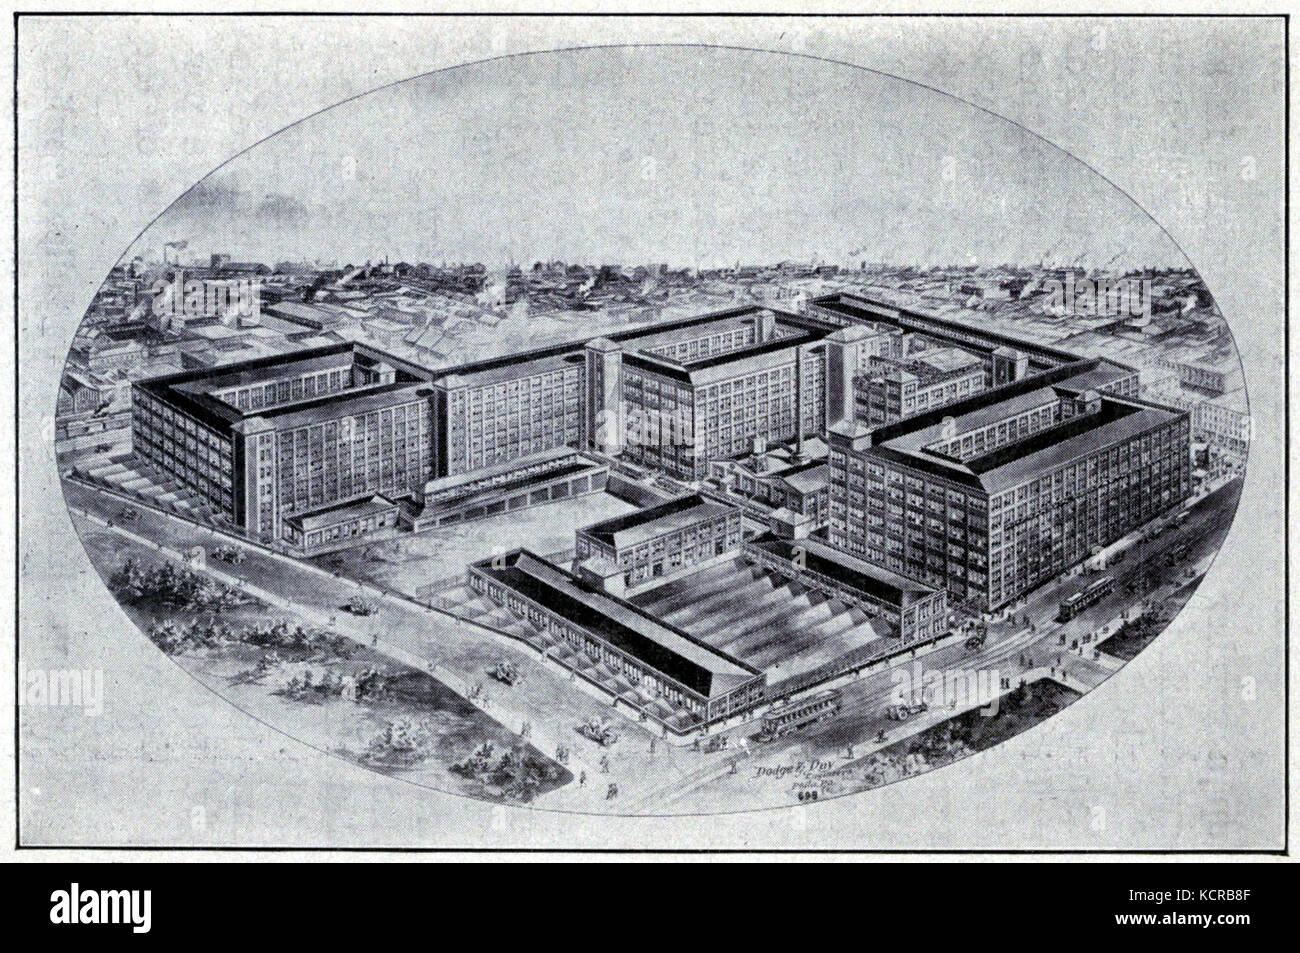 Automobile Plant Stockfotos & Automobile Plant Bilder - Alamy